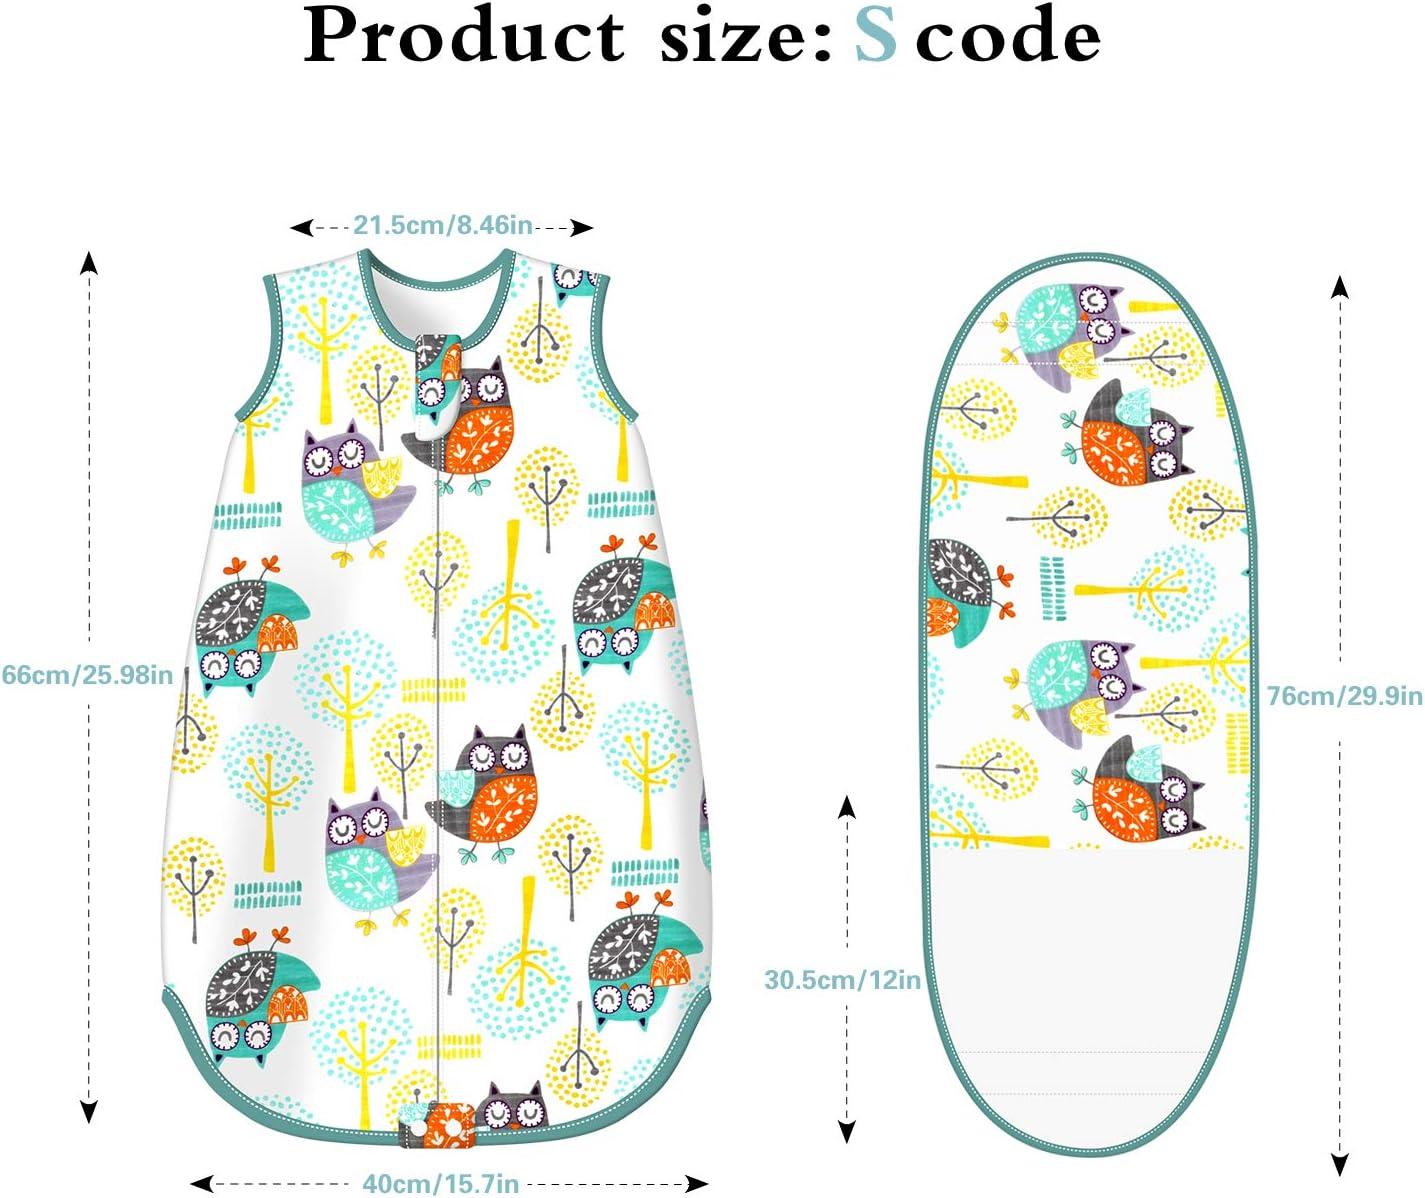 0.5 Tog Besrina Baby Sleeping Bag Cotton Breathable Swaddle Wrap Blanket Nursery Wearable Blanket Swaddle for Newborn Infant Toddler Boys Girls 0-12 Months